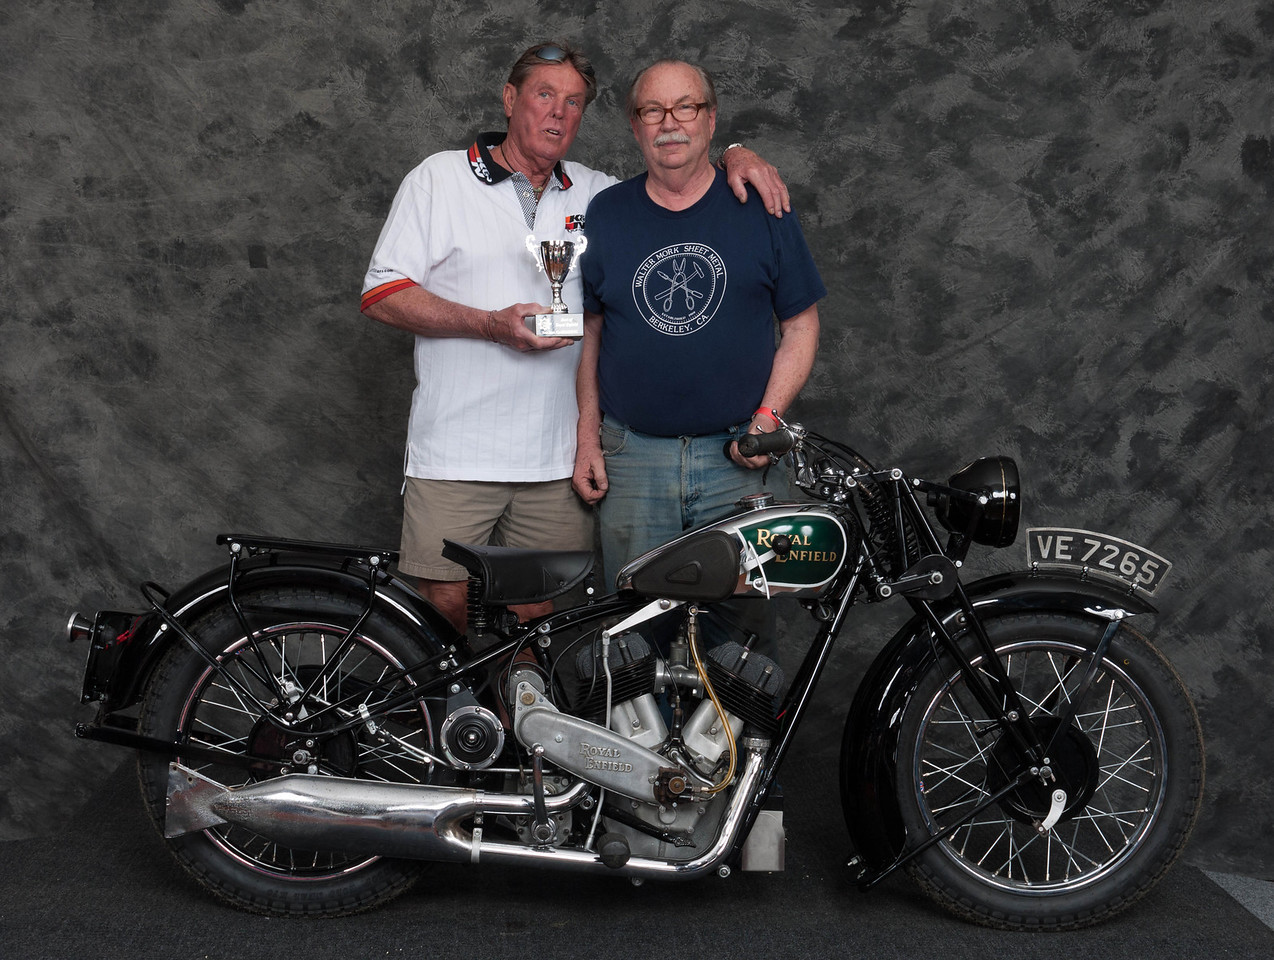 Fred Mork, Winner of Best Enfield- 1930 Royal Enfield Model K1 V-twin